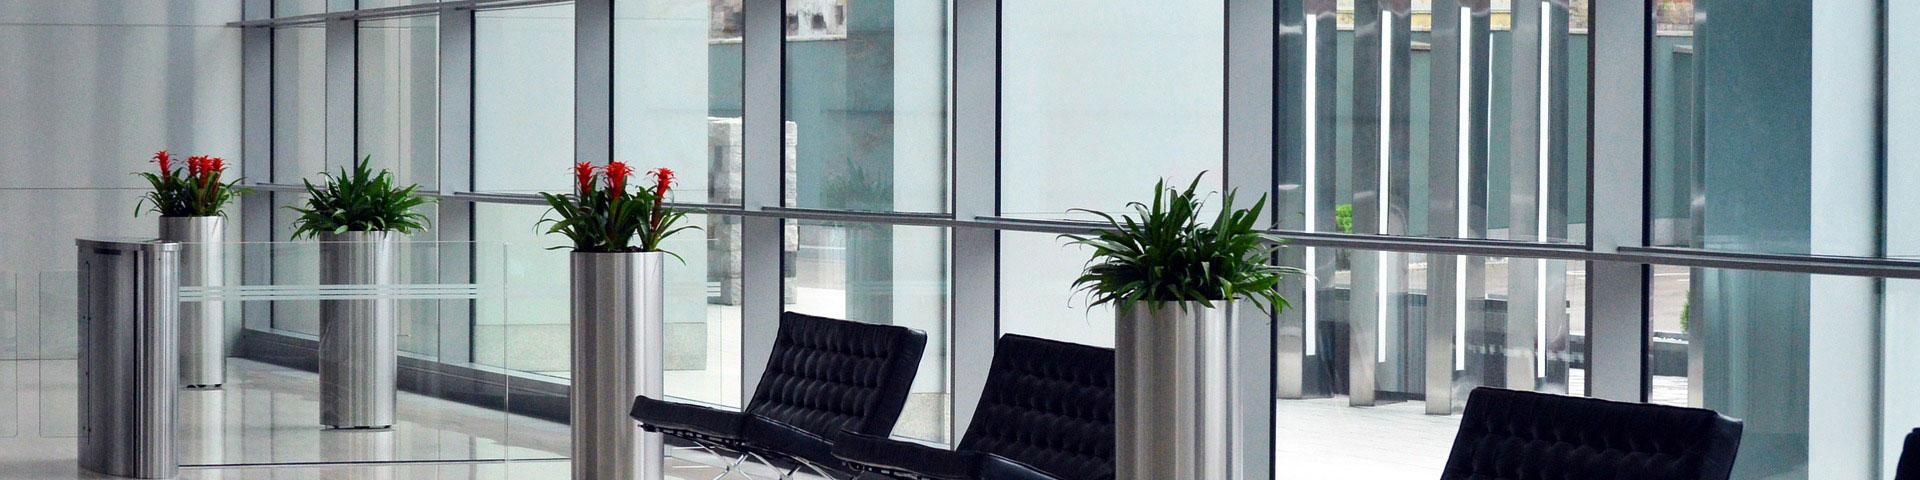 aluminium fenster i dica fenster t ren im saarland. Black Bedroom Furniture Sets. Home Design Ideas